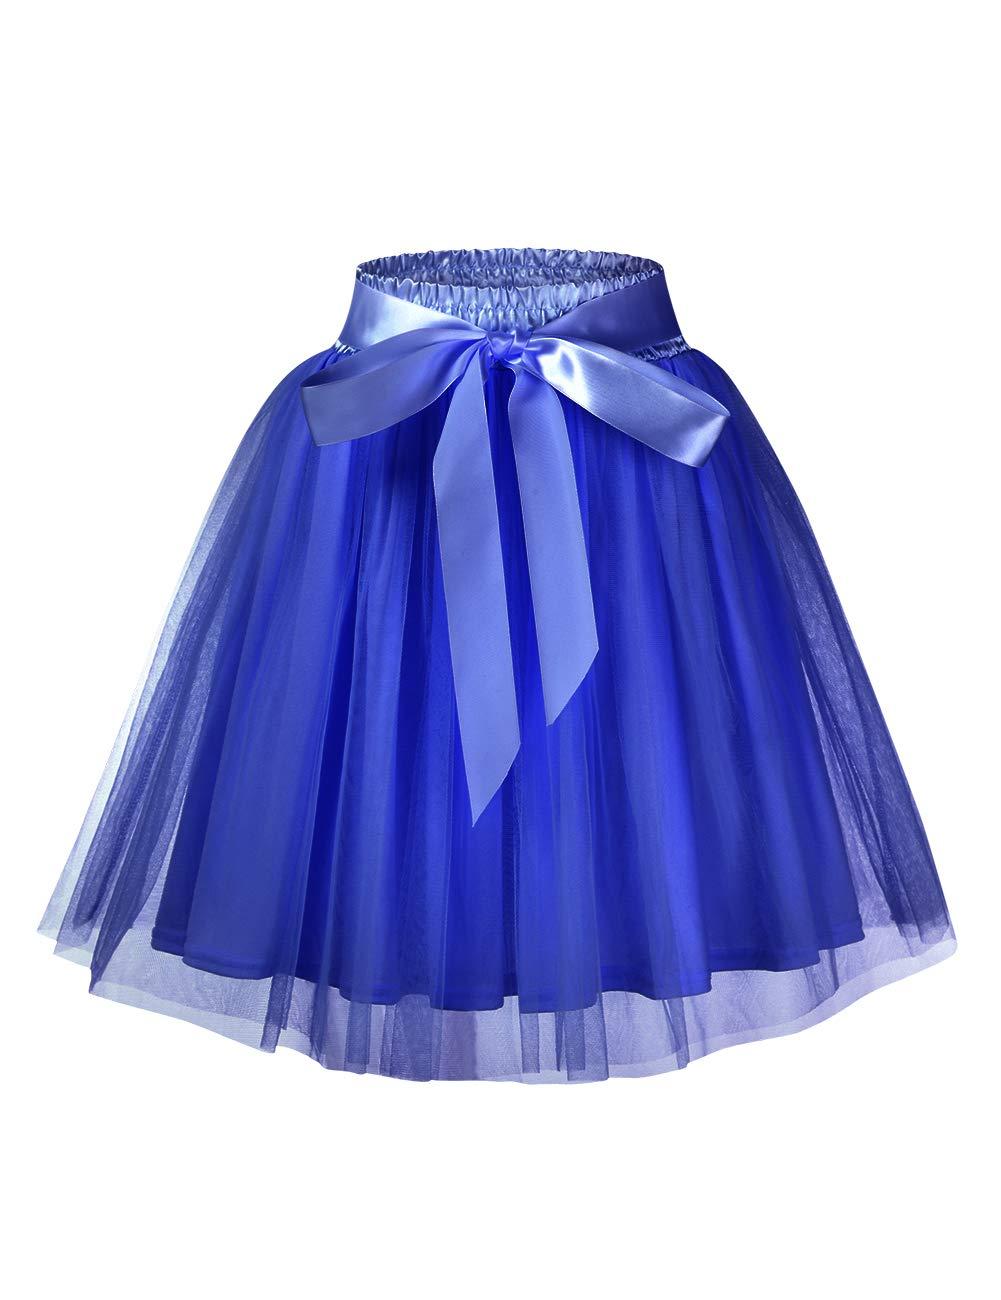 GlorySunshine Women's A Line Princess Tulle Wedding Prom Party Tutu Skirt Printed Ruffles Polka Dot Casual Skirt